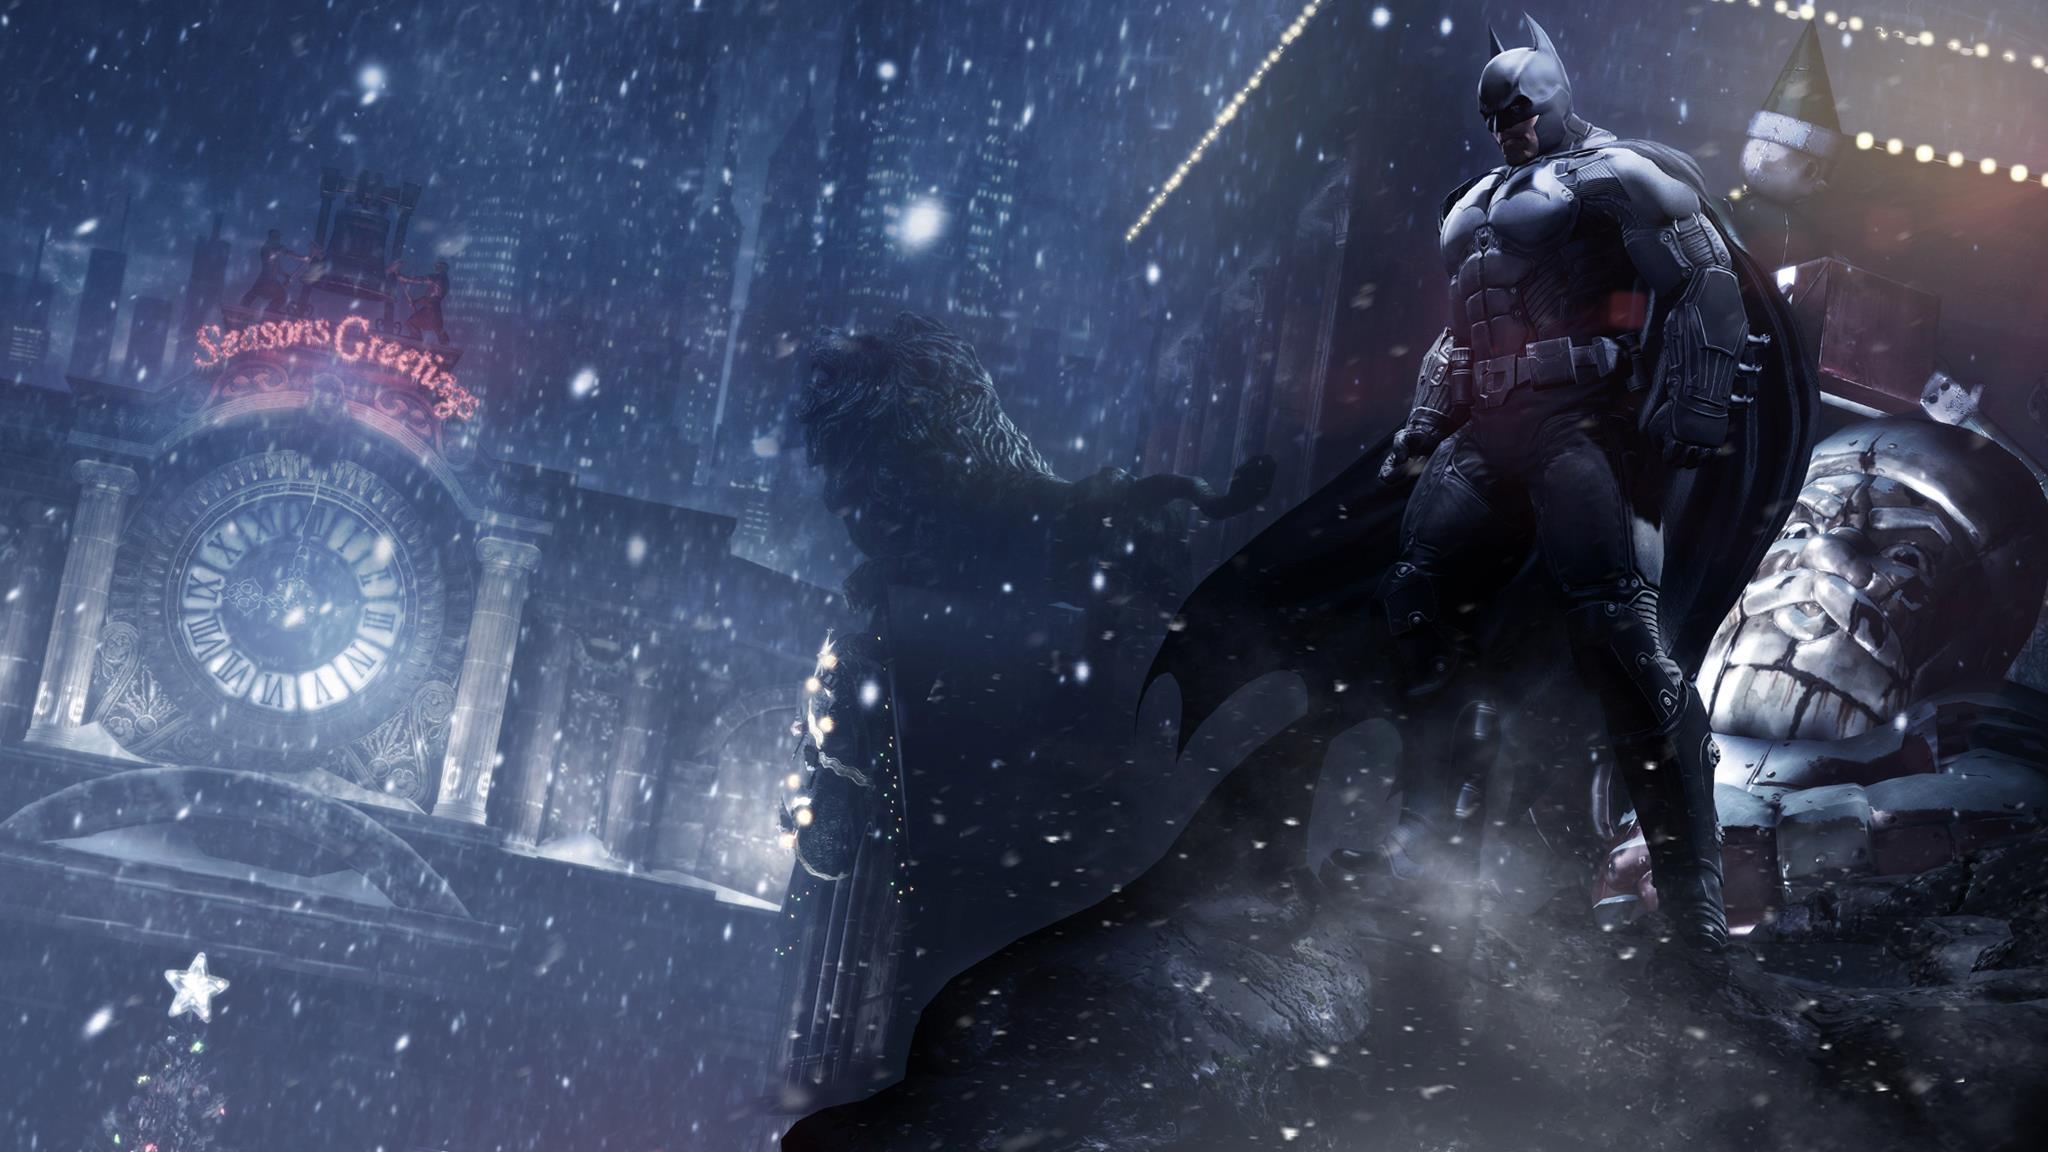 Batman: Arkham Origins Screenshots Are Full Of Christmas Cheer #26515